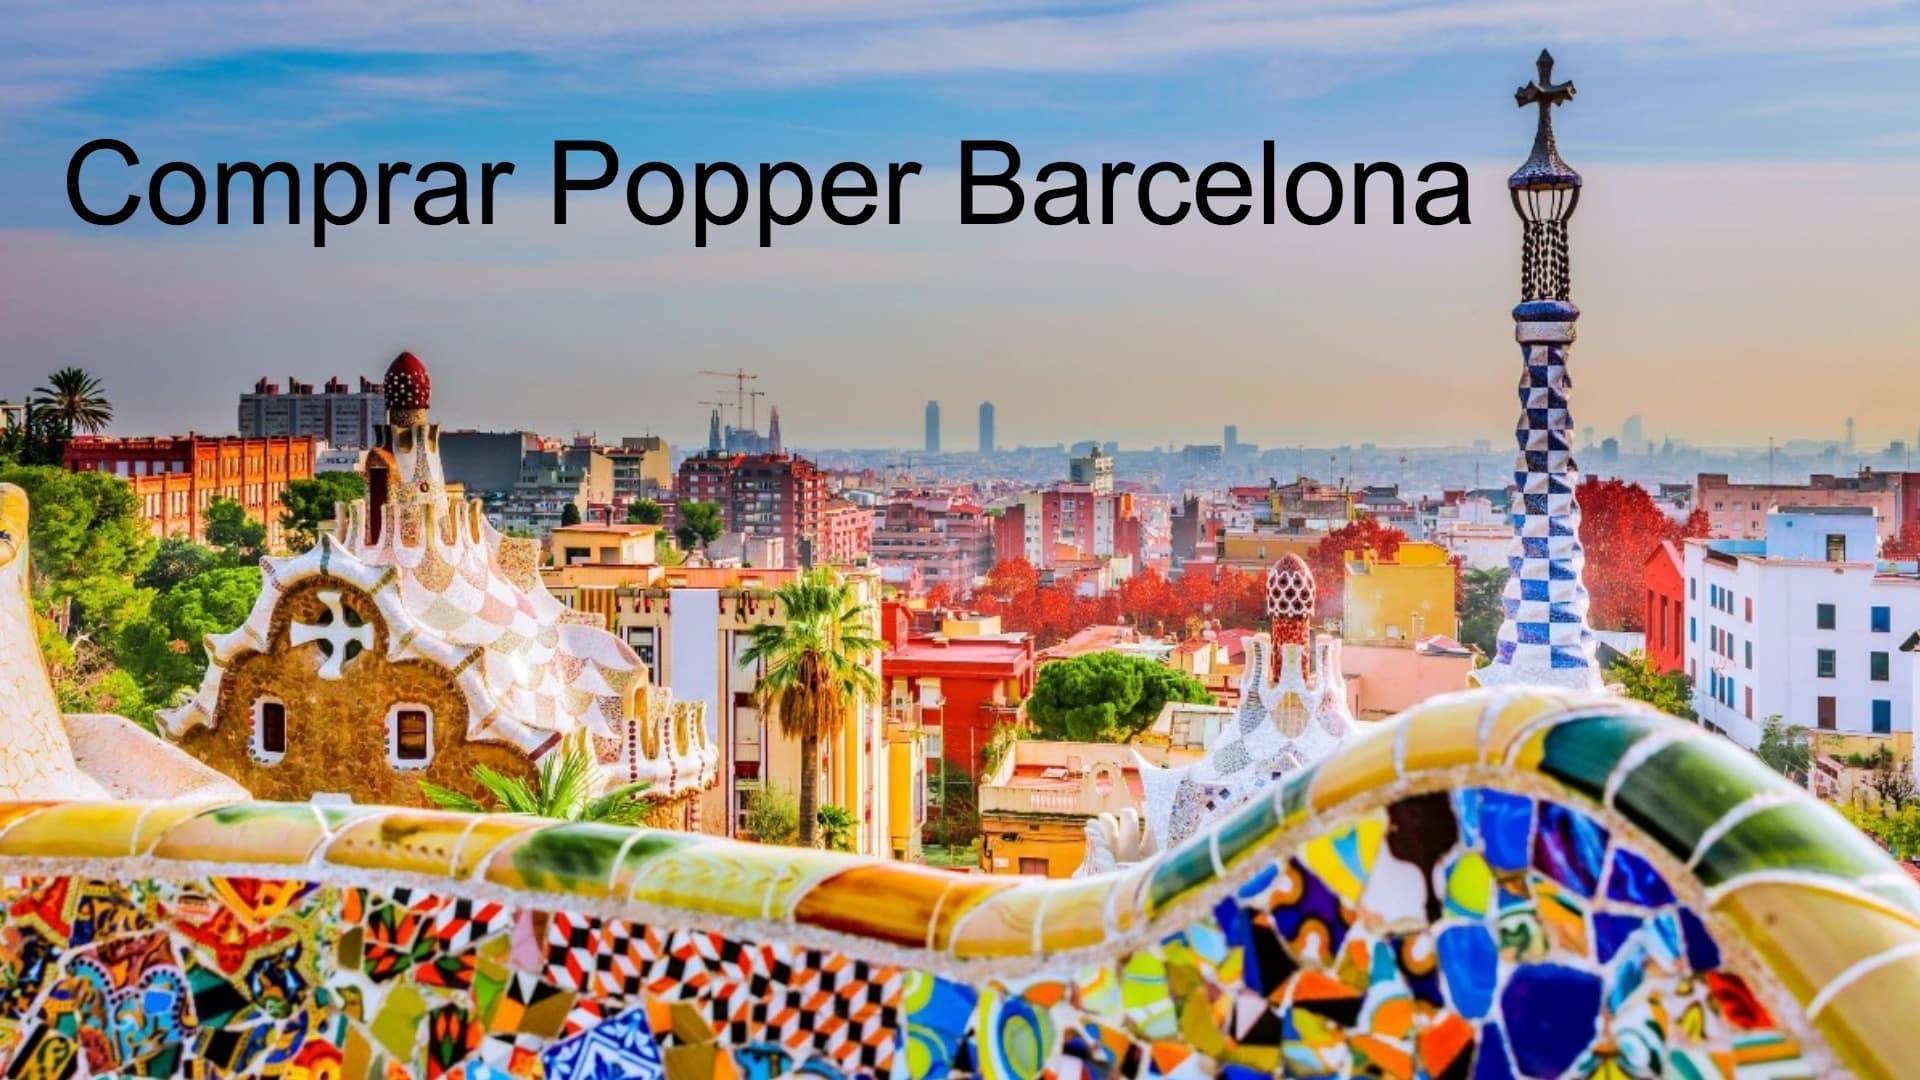 Comprar Popper en Barcelona